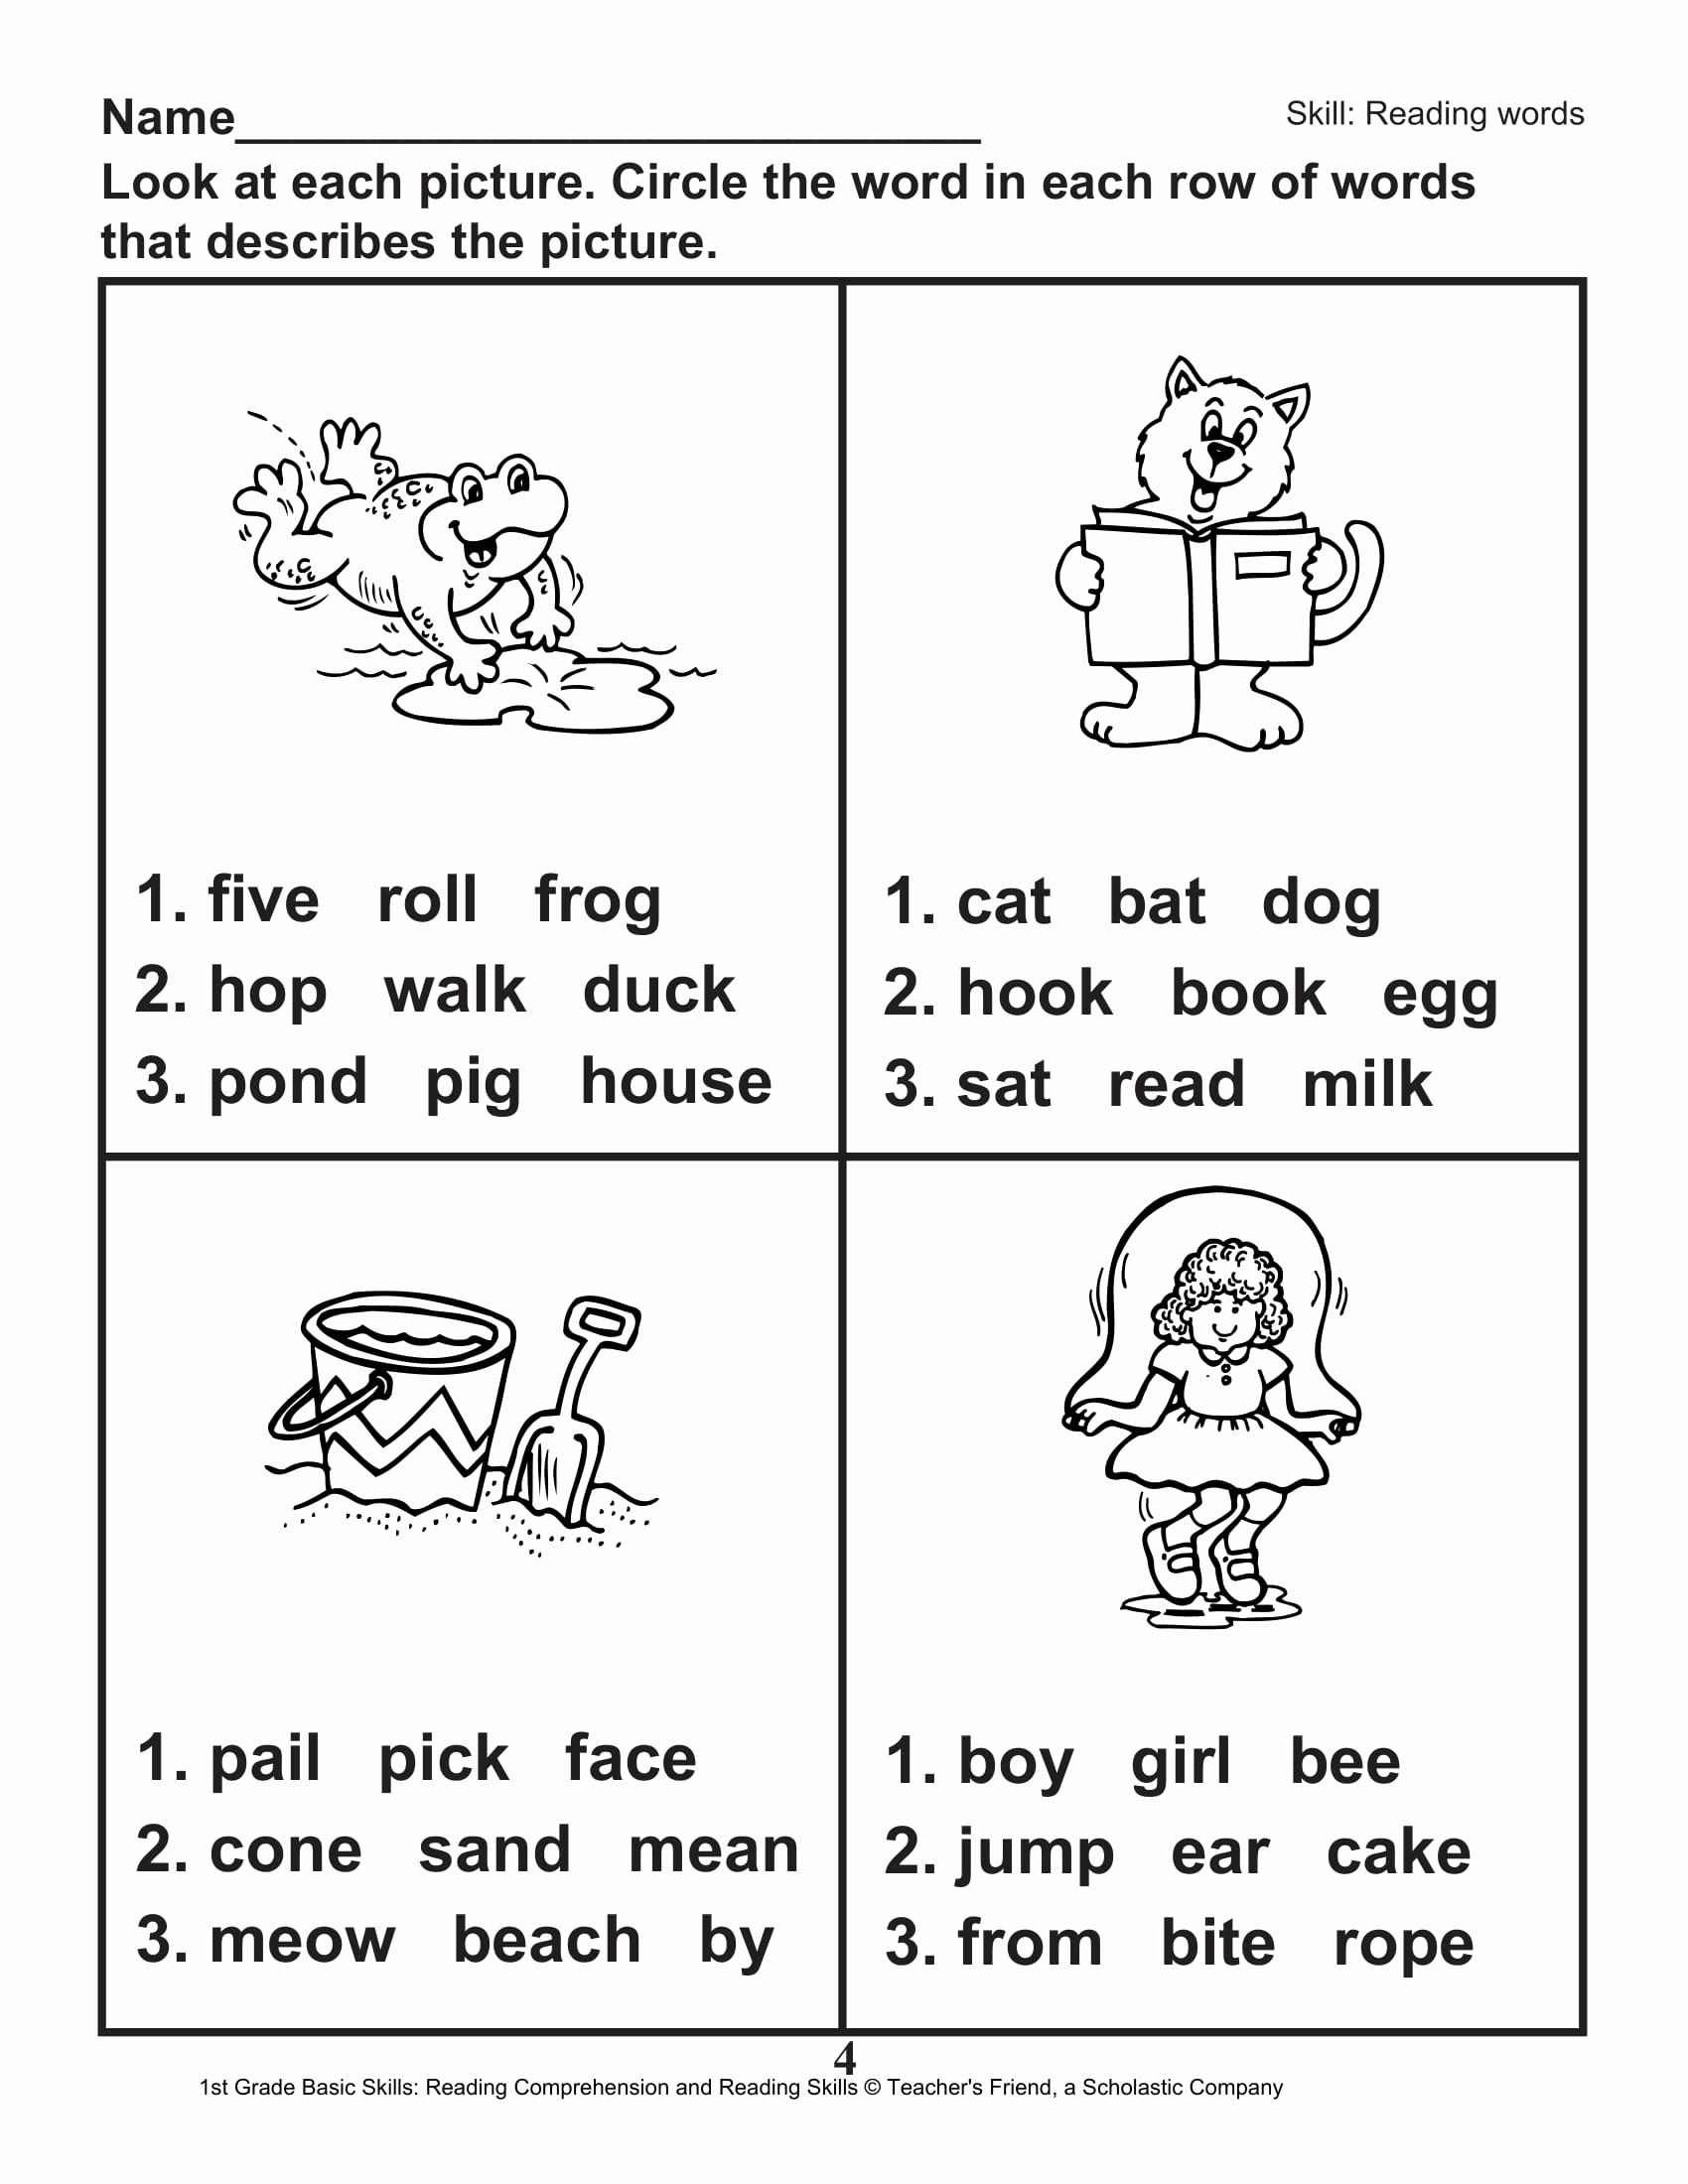 Comprehension Worksheet First Grade Unique 40 Scholastic 1st Grade Reading Prehension Skills